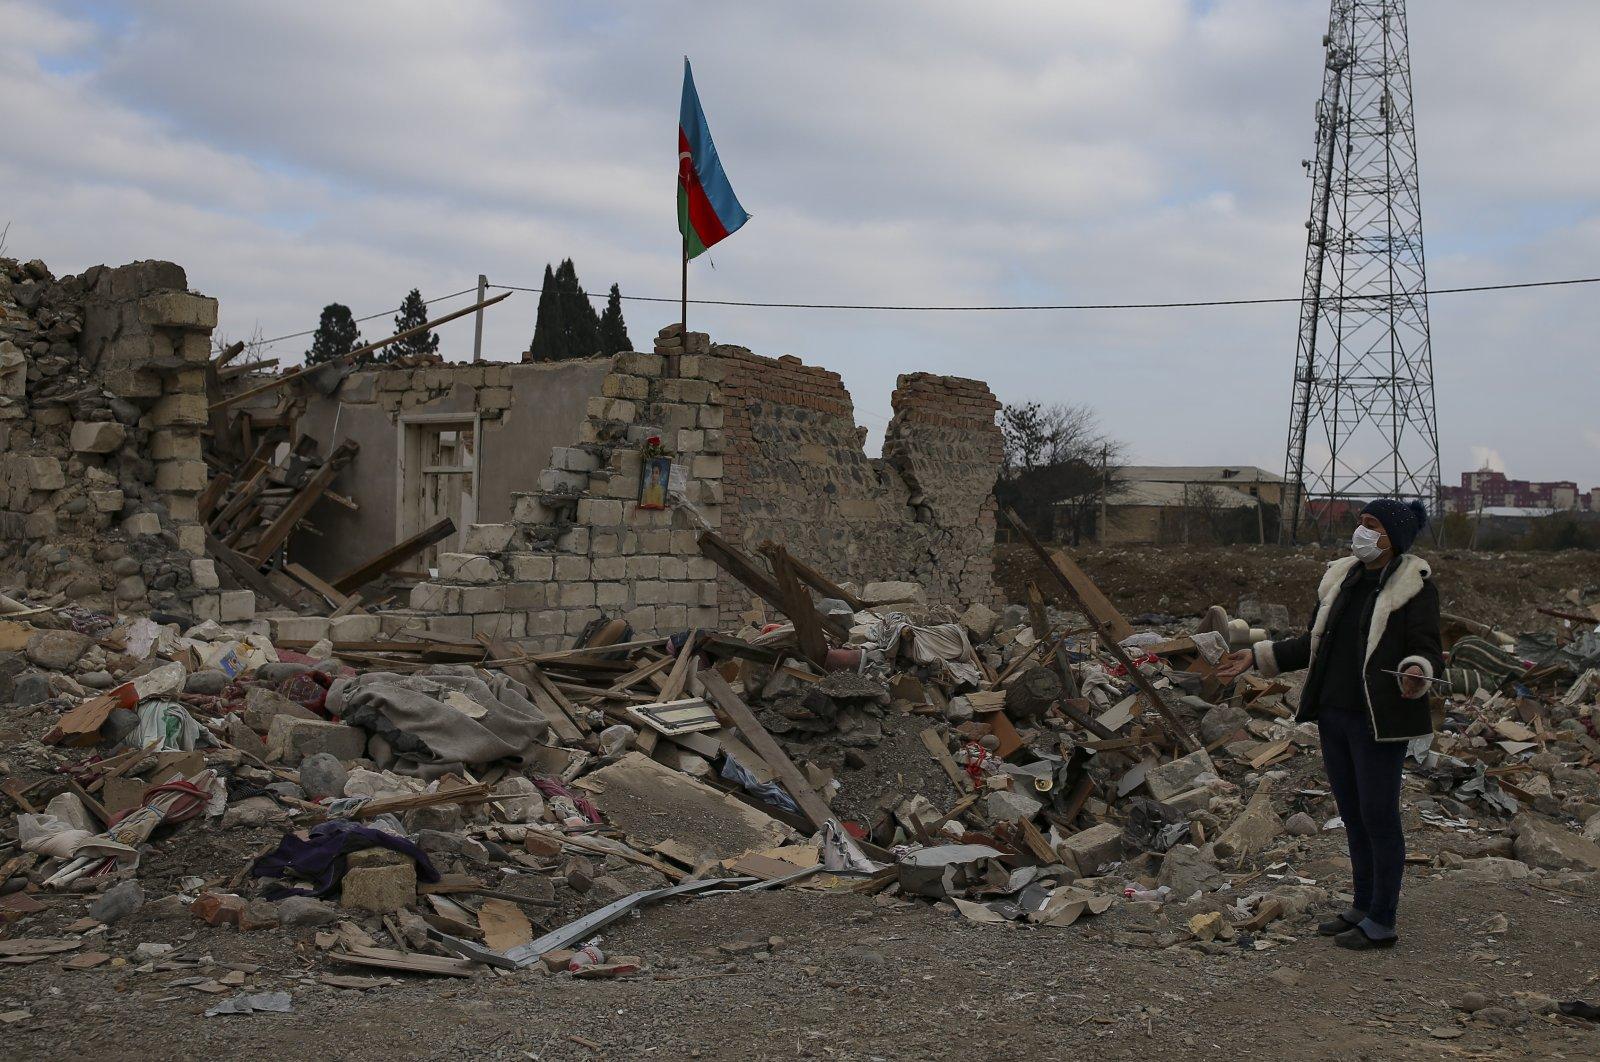 An Azerbaijani man named Saire Guliyeva stands near the ruins of his dwelling, Ganja, Azerbaijan, Nov. 28, 2020. (AP File Photo)